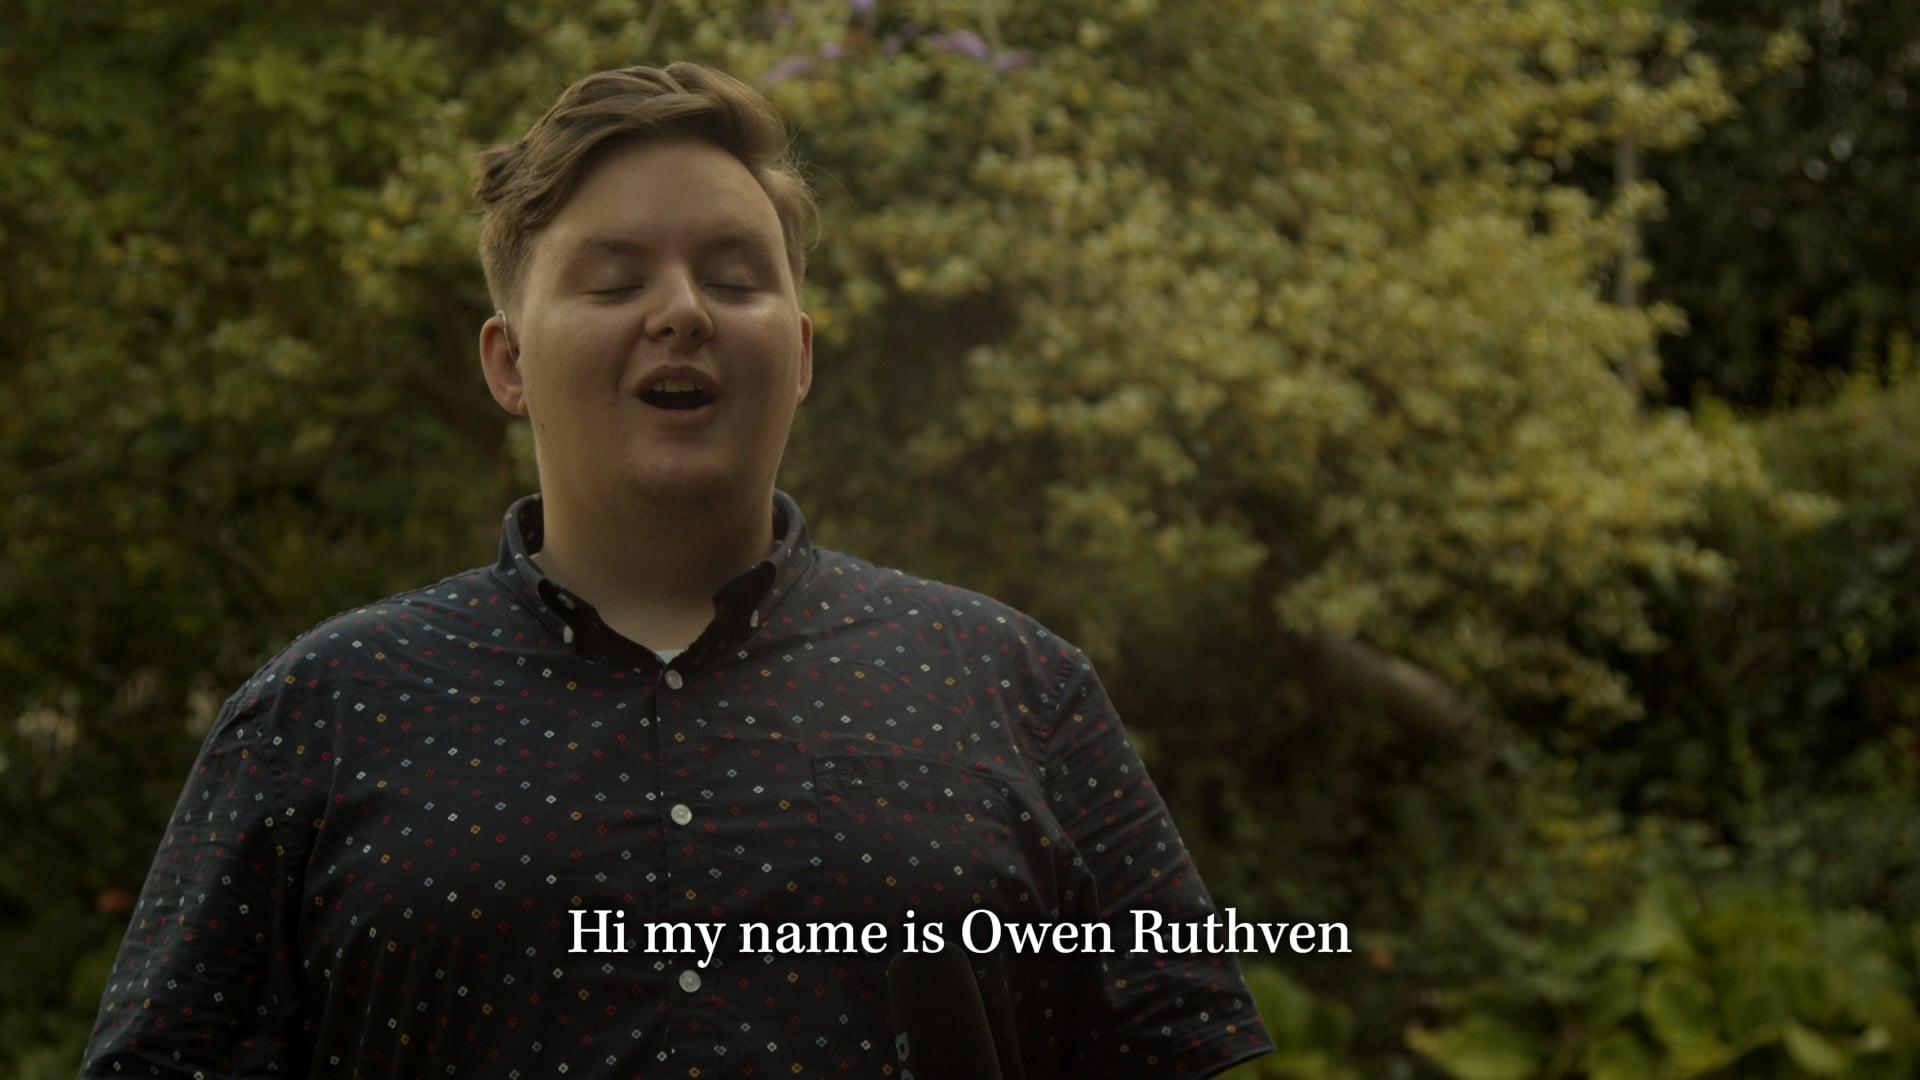 Owen Ruthven